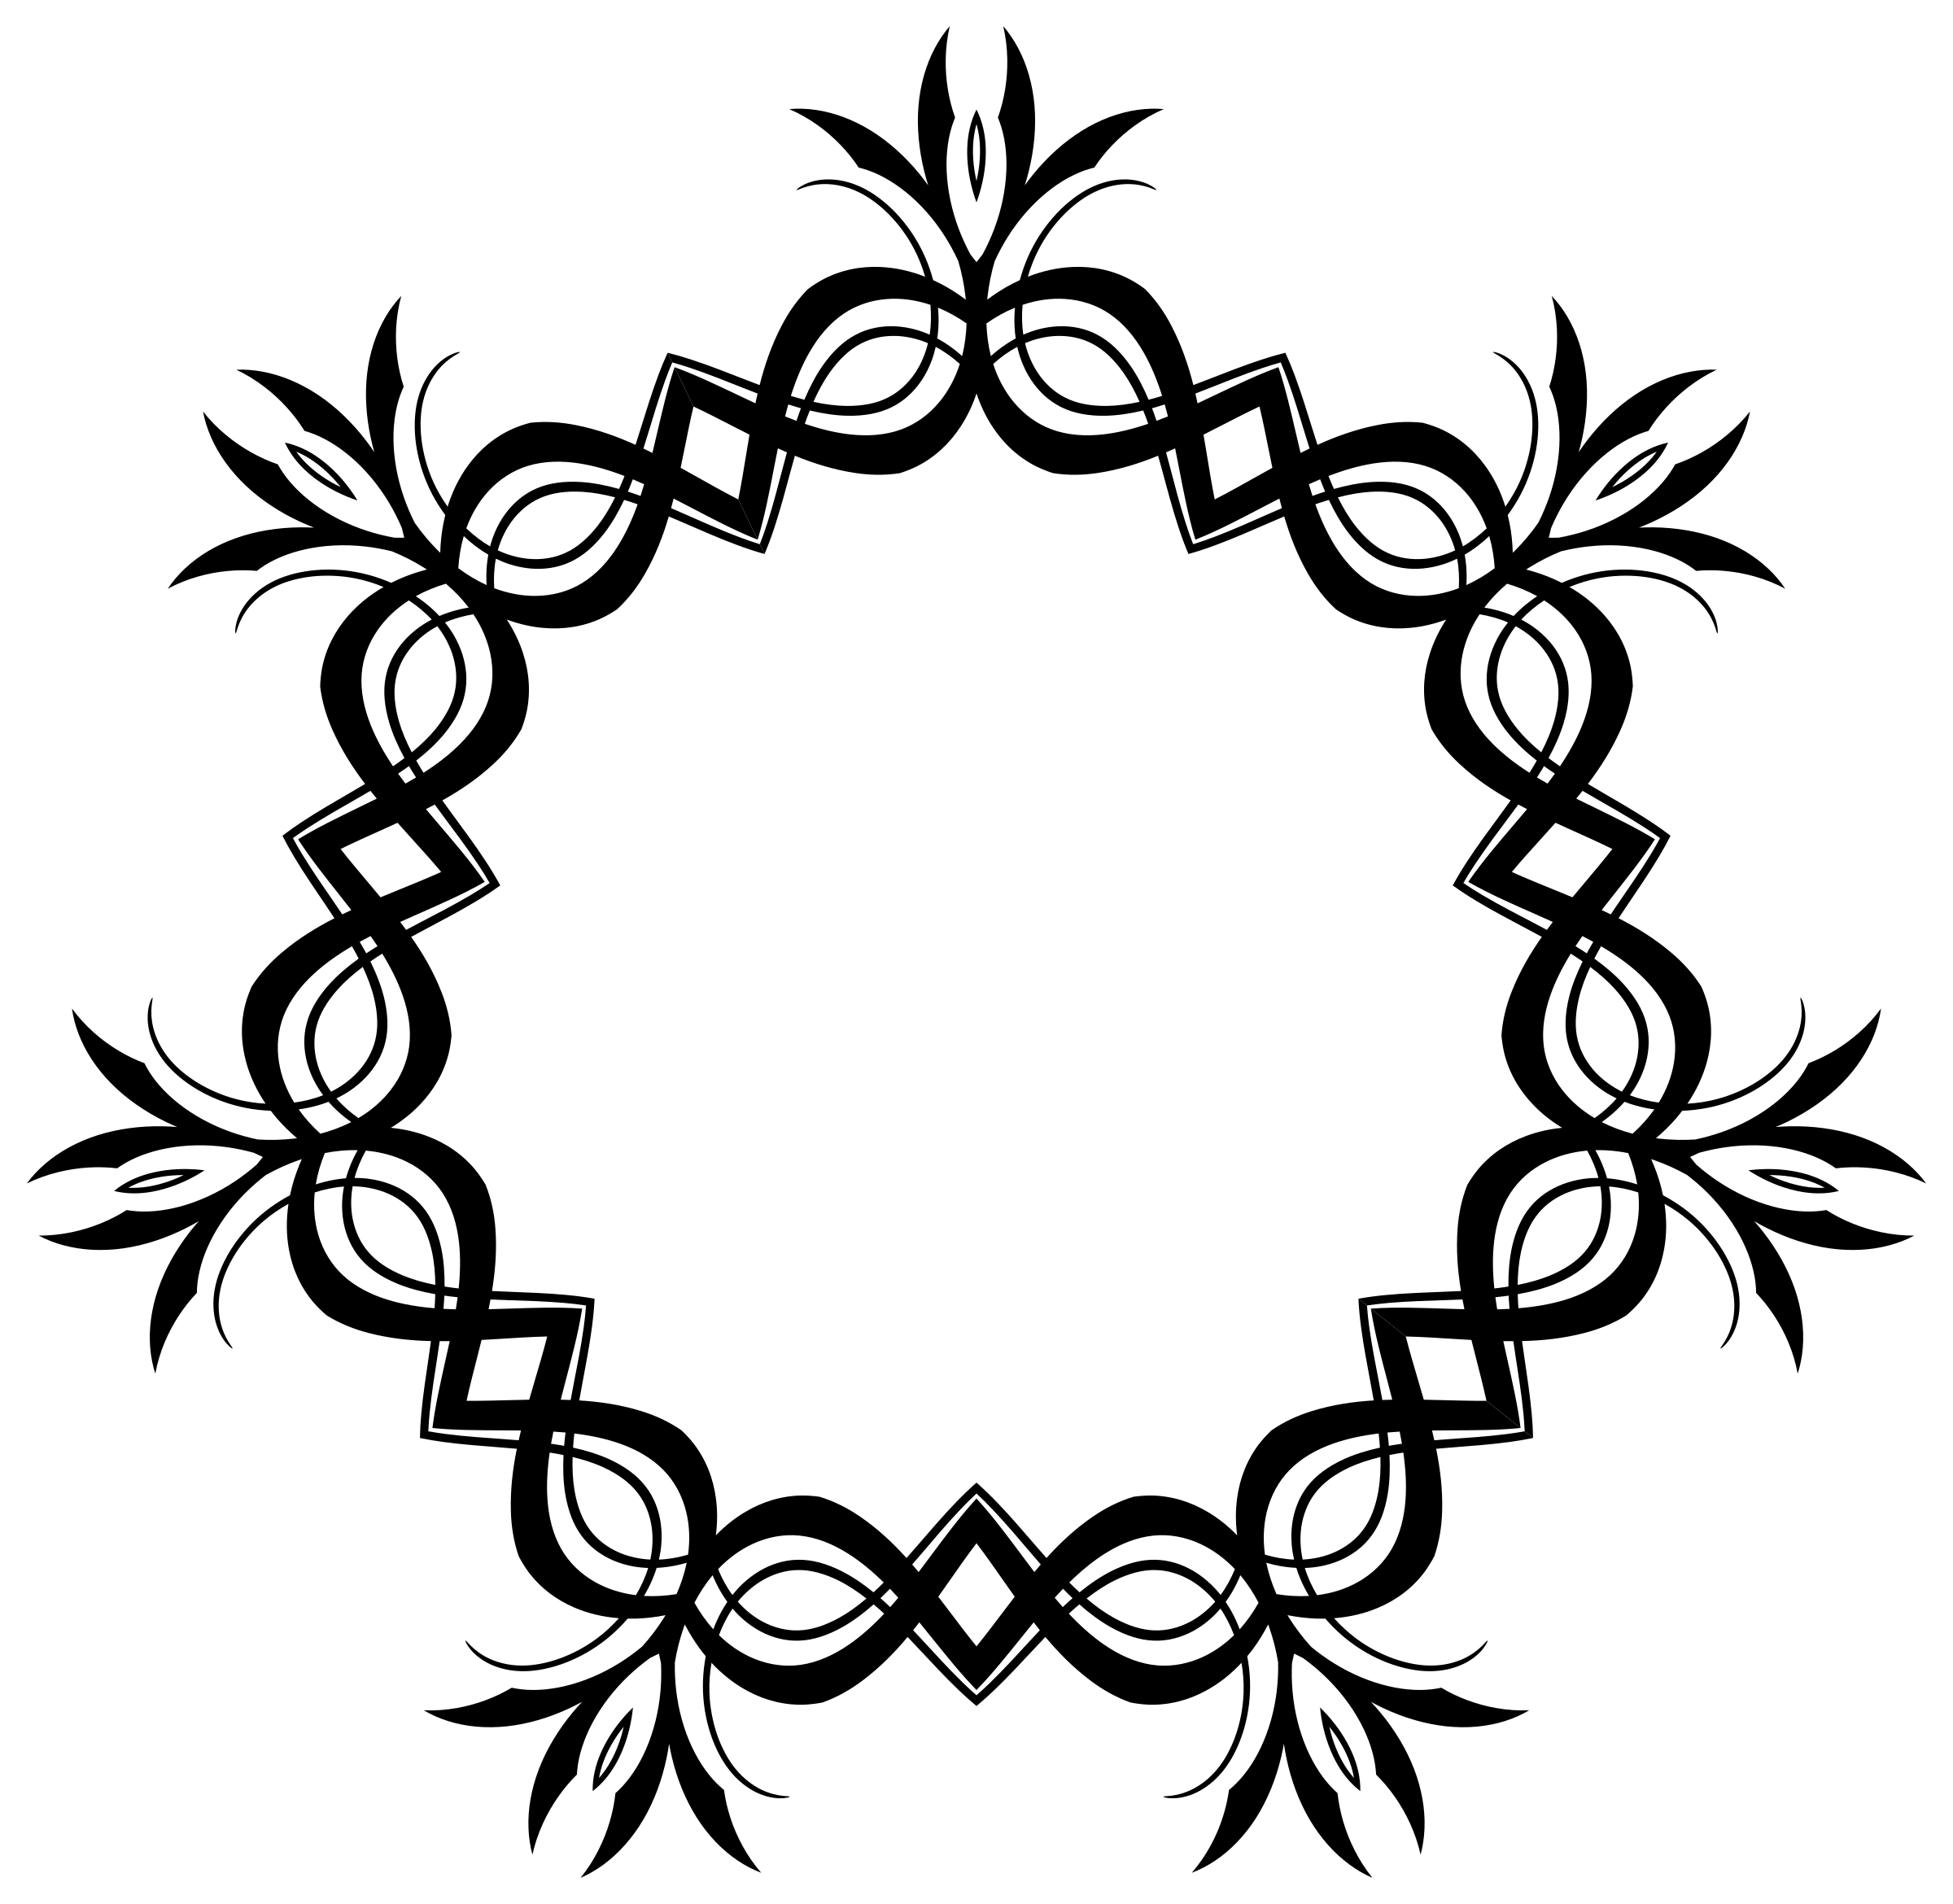 Clipart circle leaf. Round frame big image